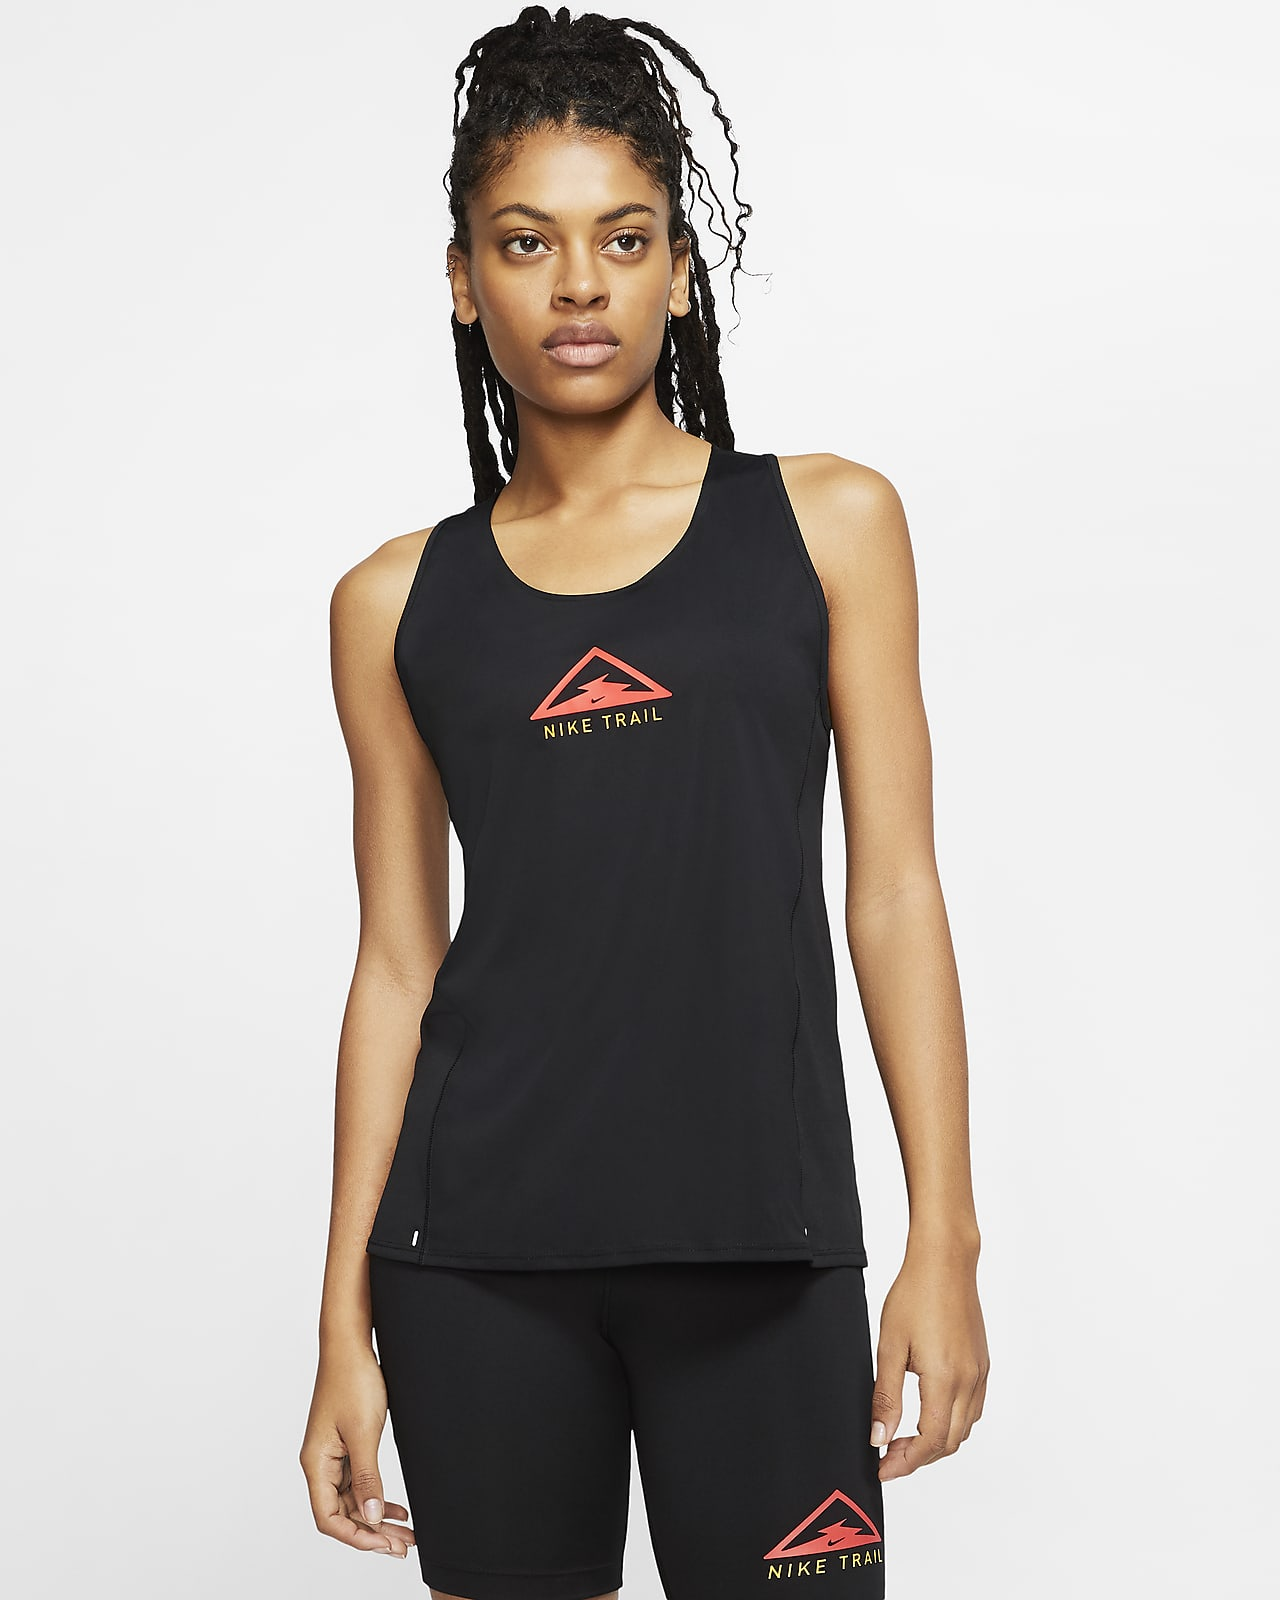 Dámské trailové běžecké tílko Nike City Sleek